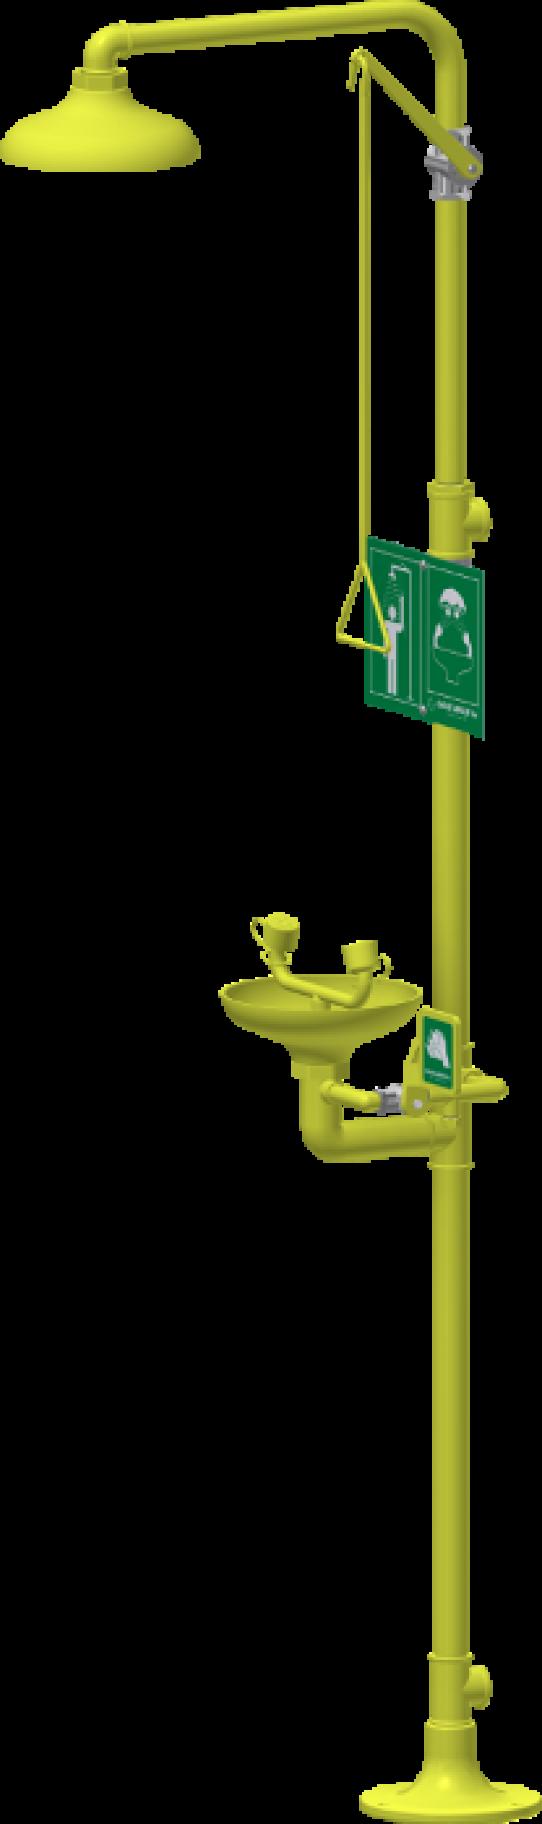 Pedestal shower and eyewash, ABS shower head / bowl, low ceiling